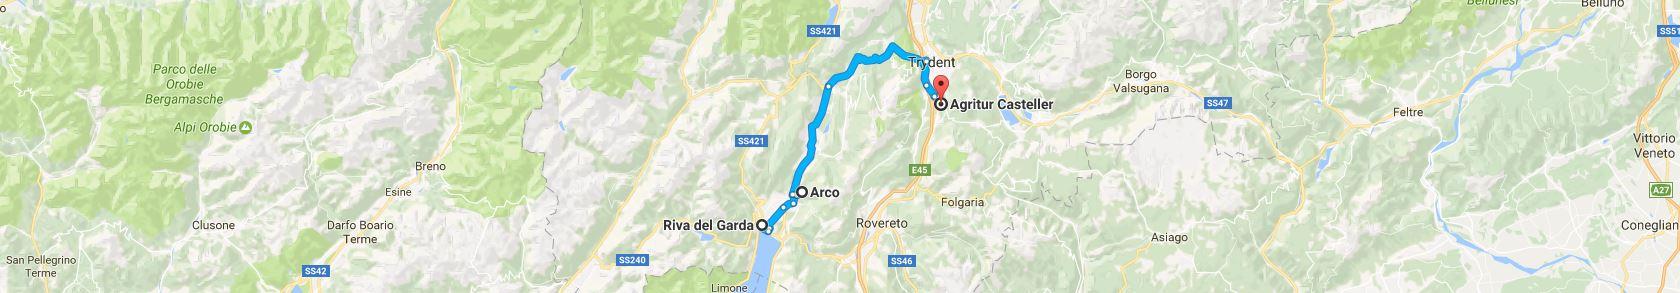 Trasa z Riva del Garda do Trydentu